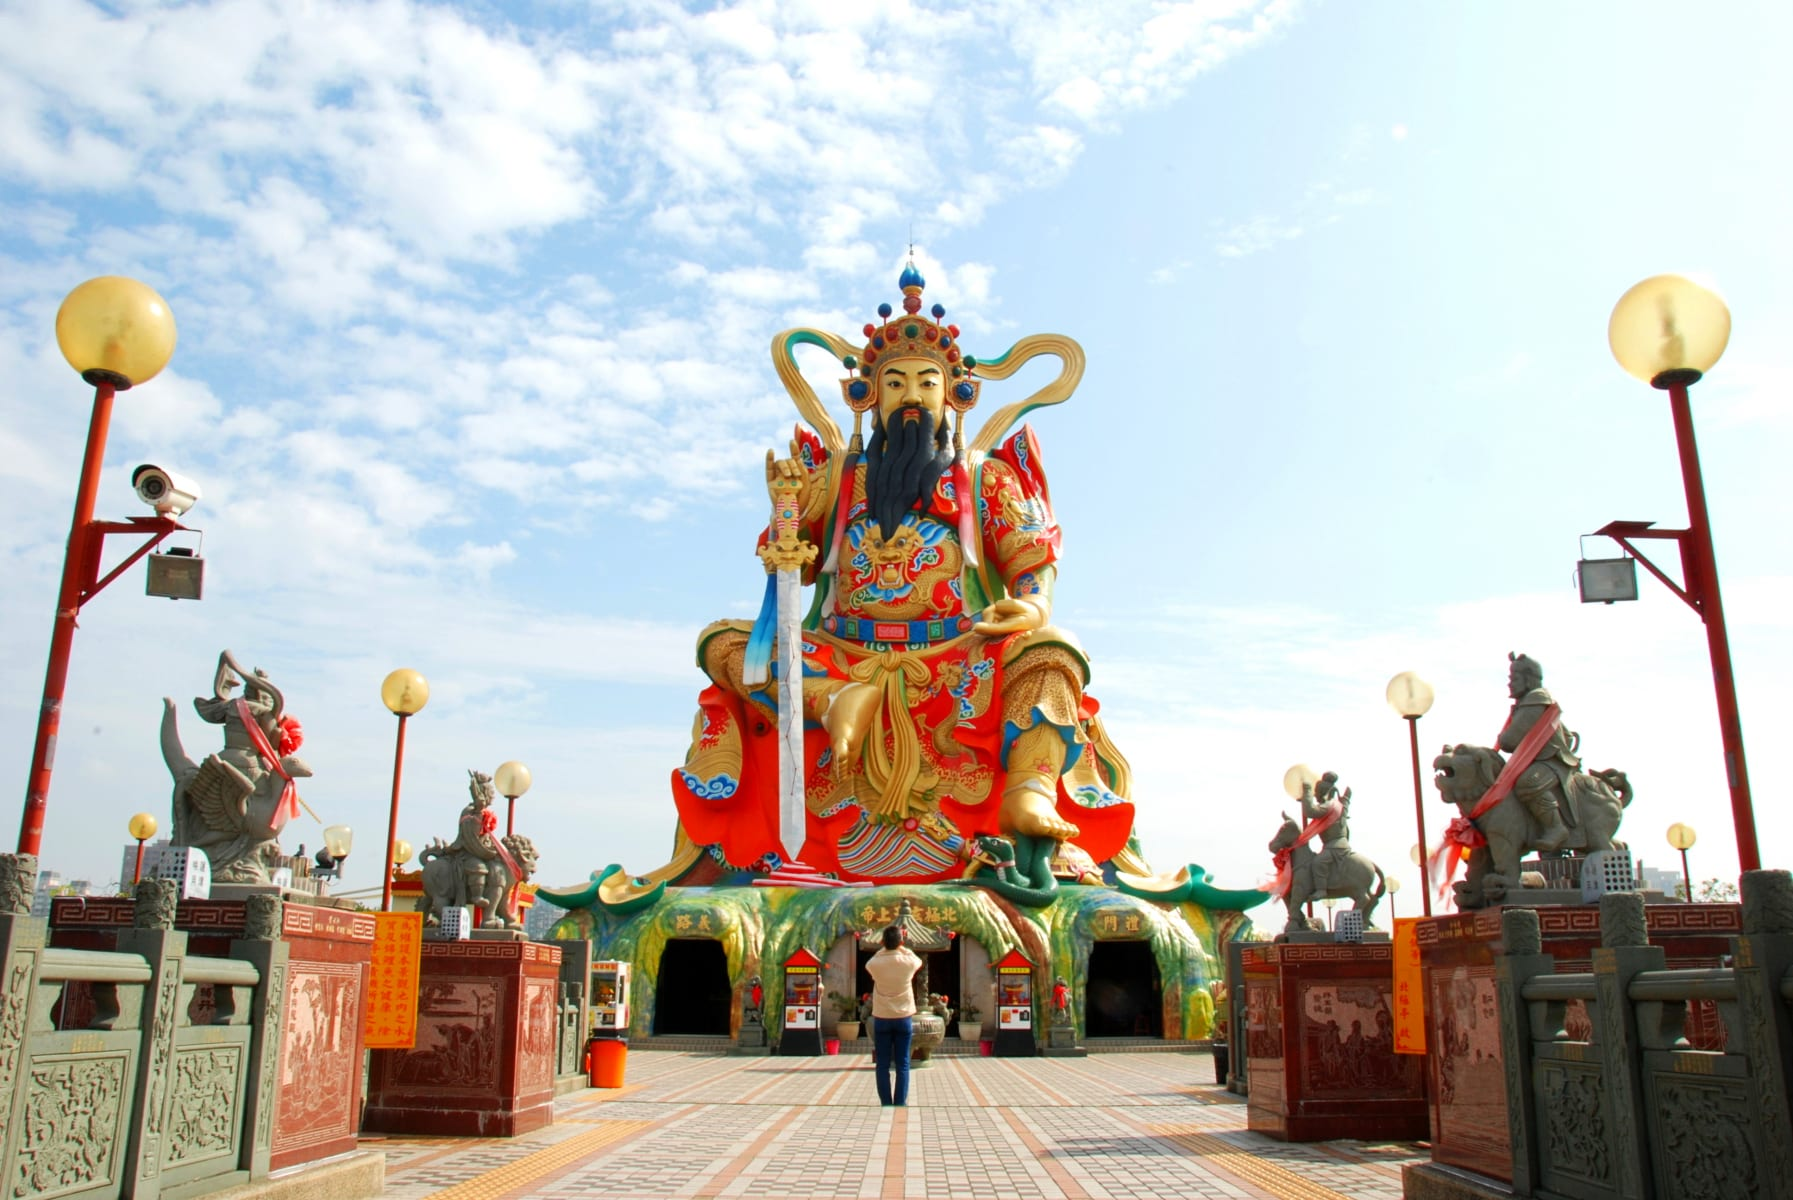 Socha taoistického boha Xuan Tian Shang Di u Lotusového jezera v Kao-siungu